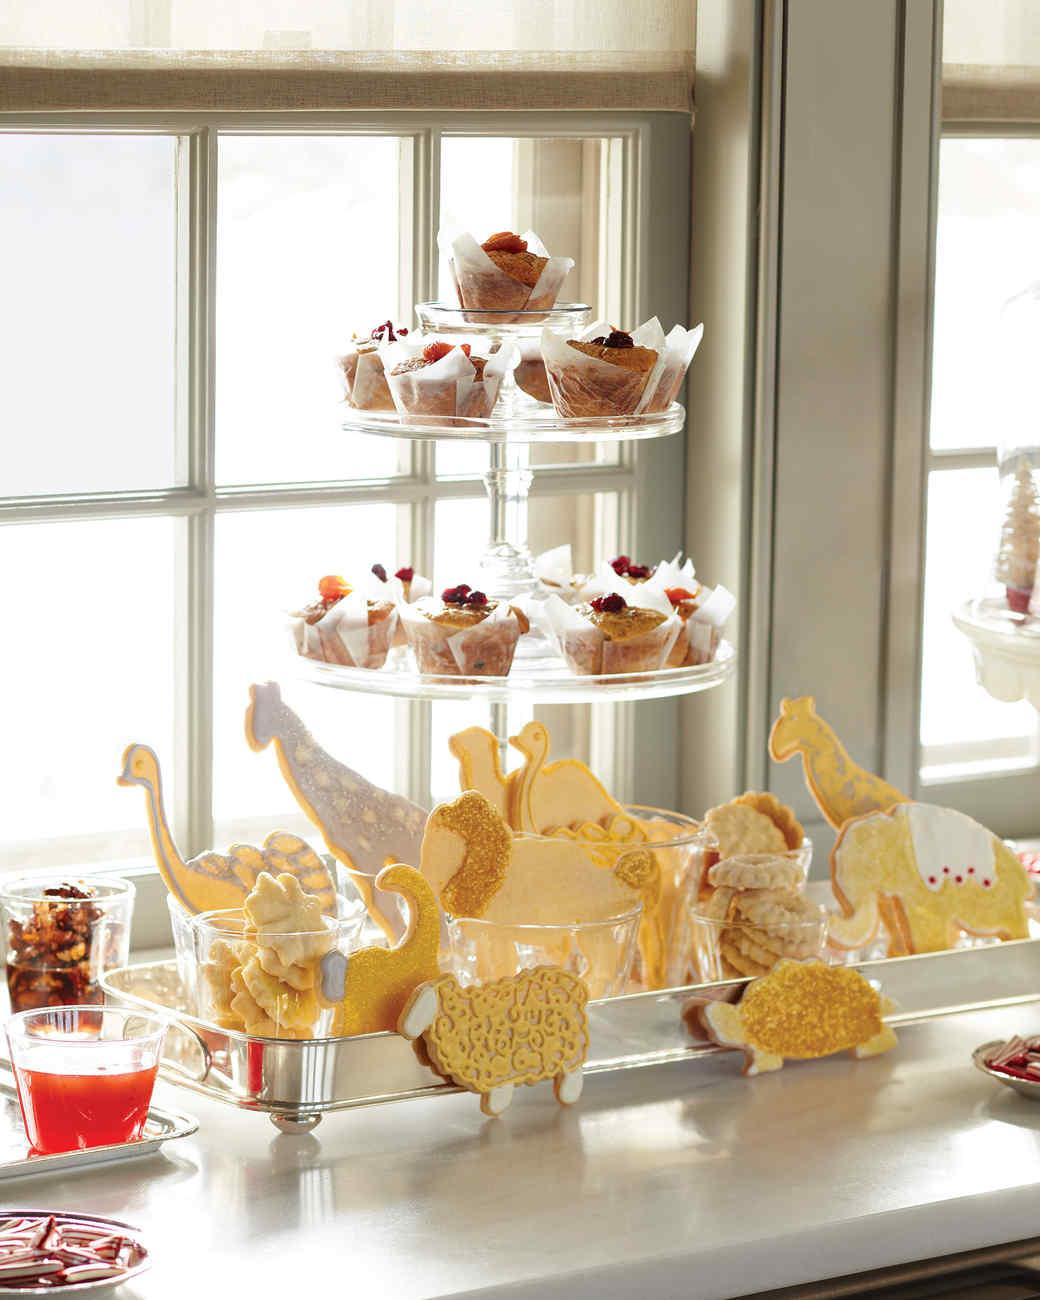 Royal Icing for Noah's Ark Sugar Cookies